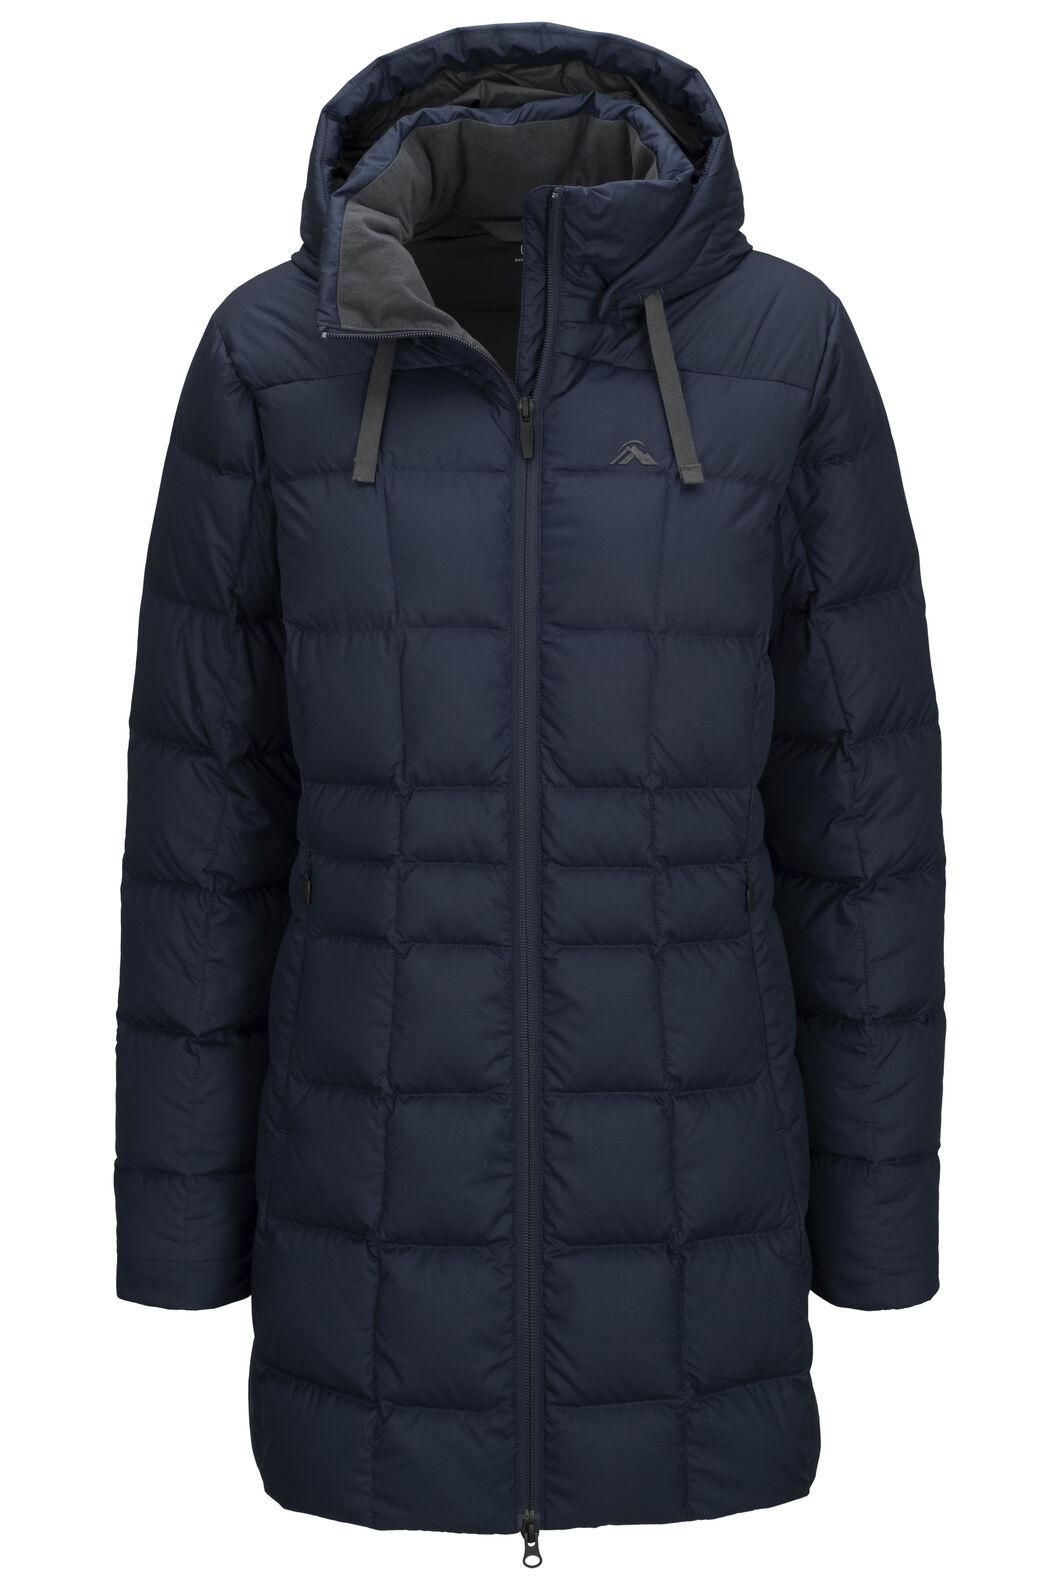 Macpac Aurora Hooded Down Coat — Women's, Carbon, hi-res